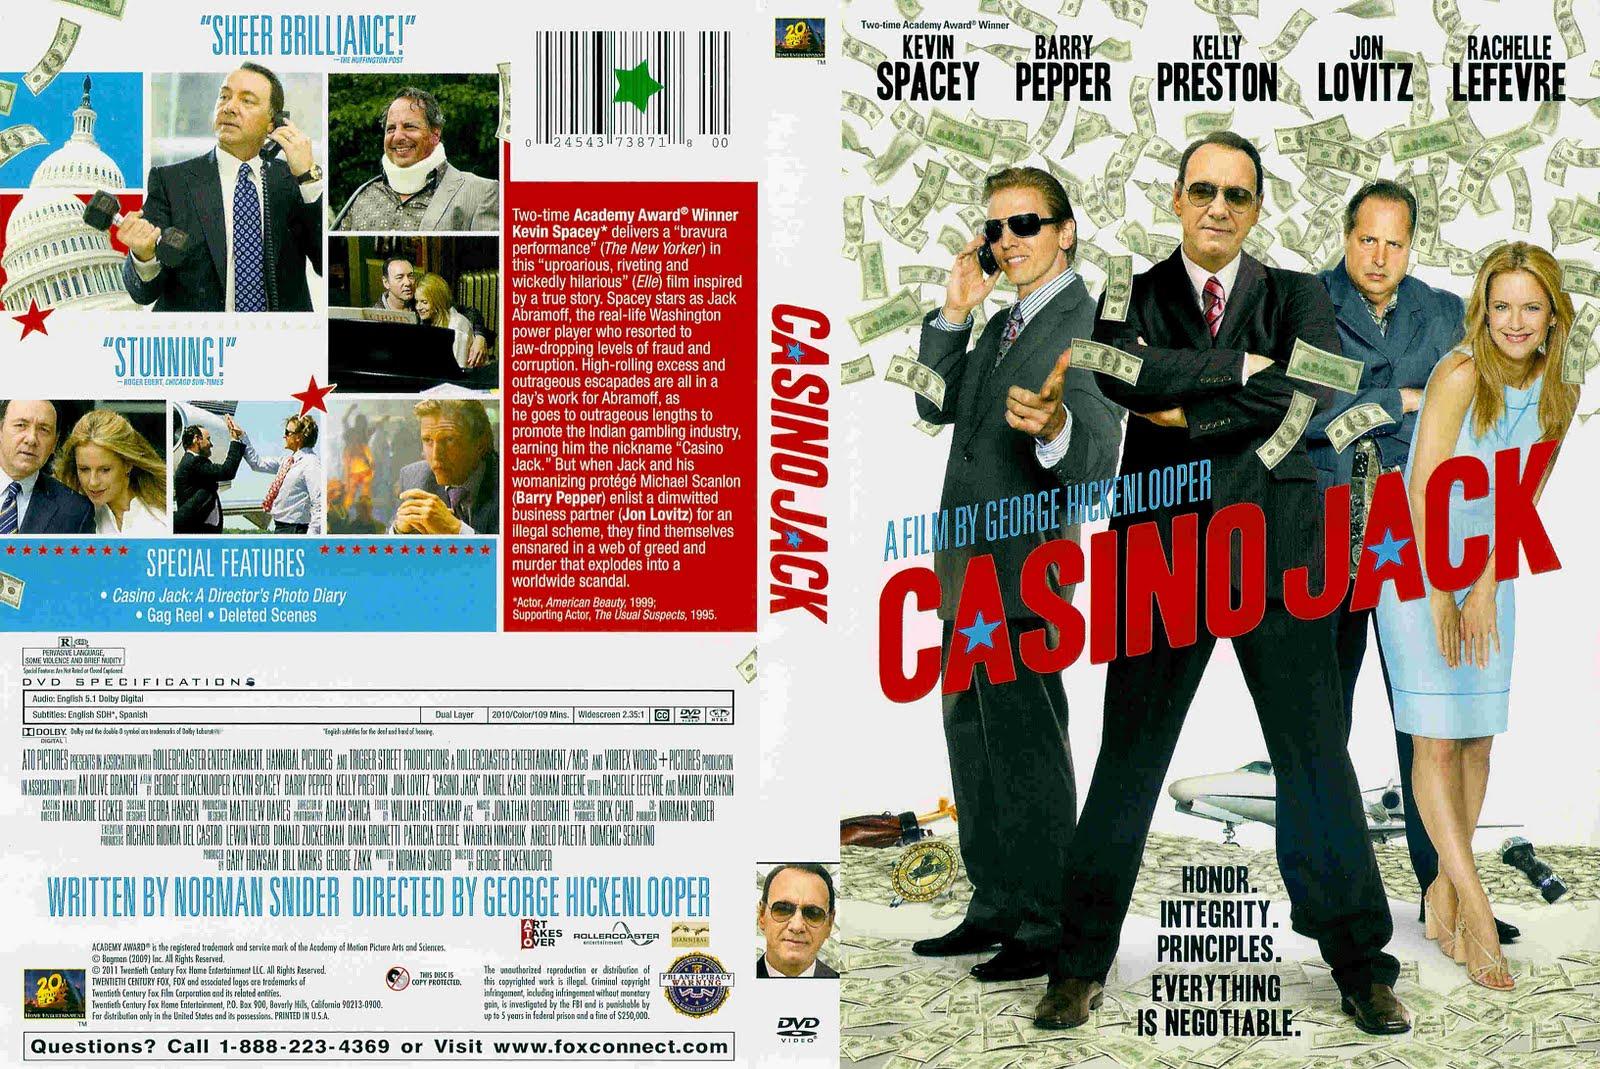 Casino jack free online casino hit nova gorica